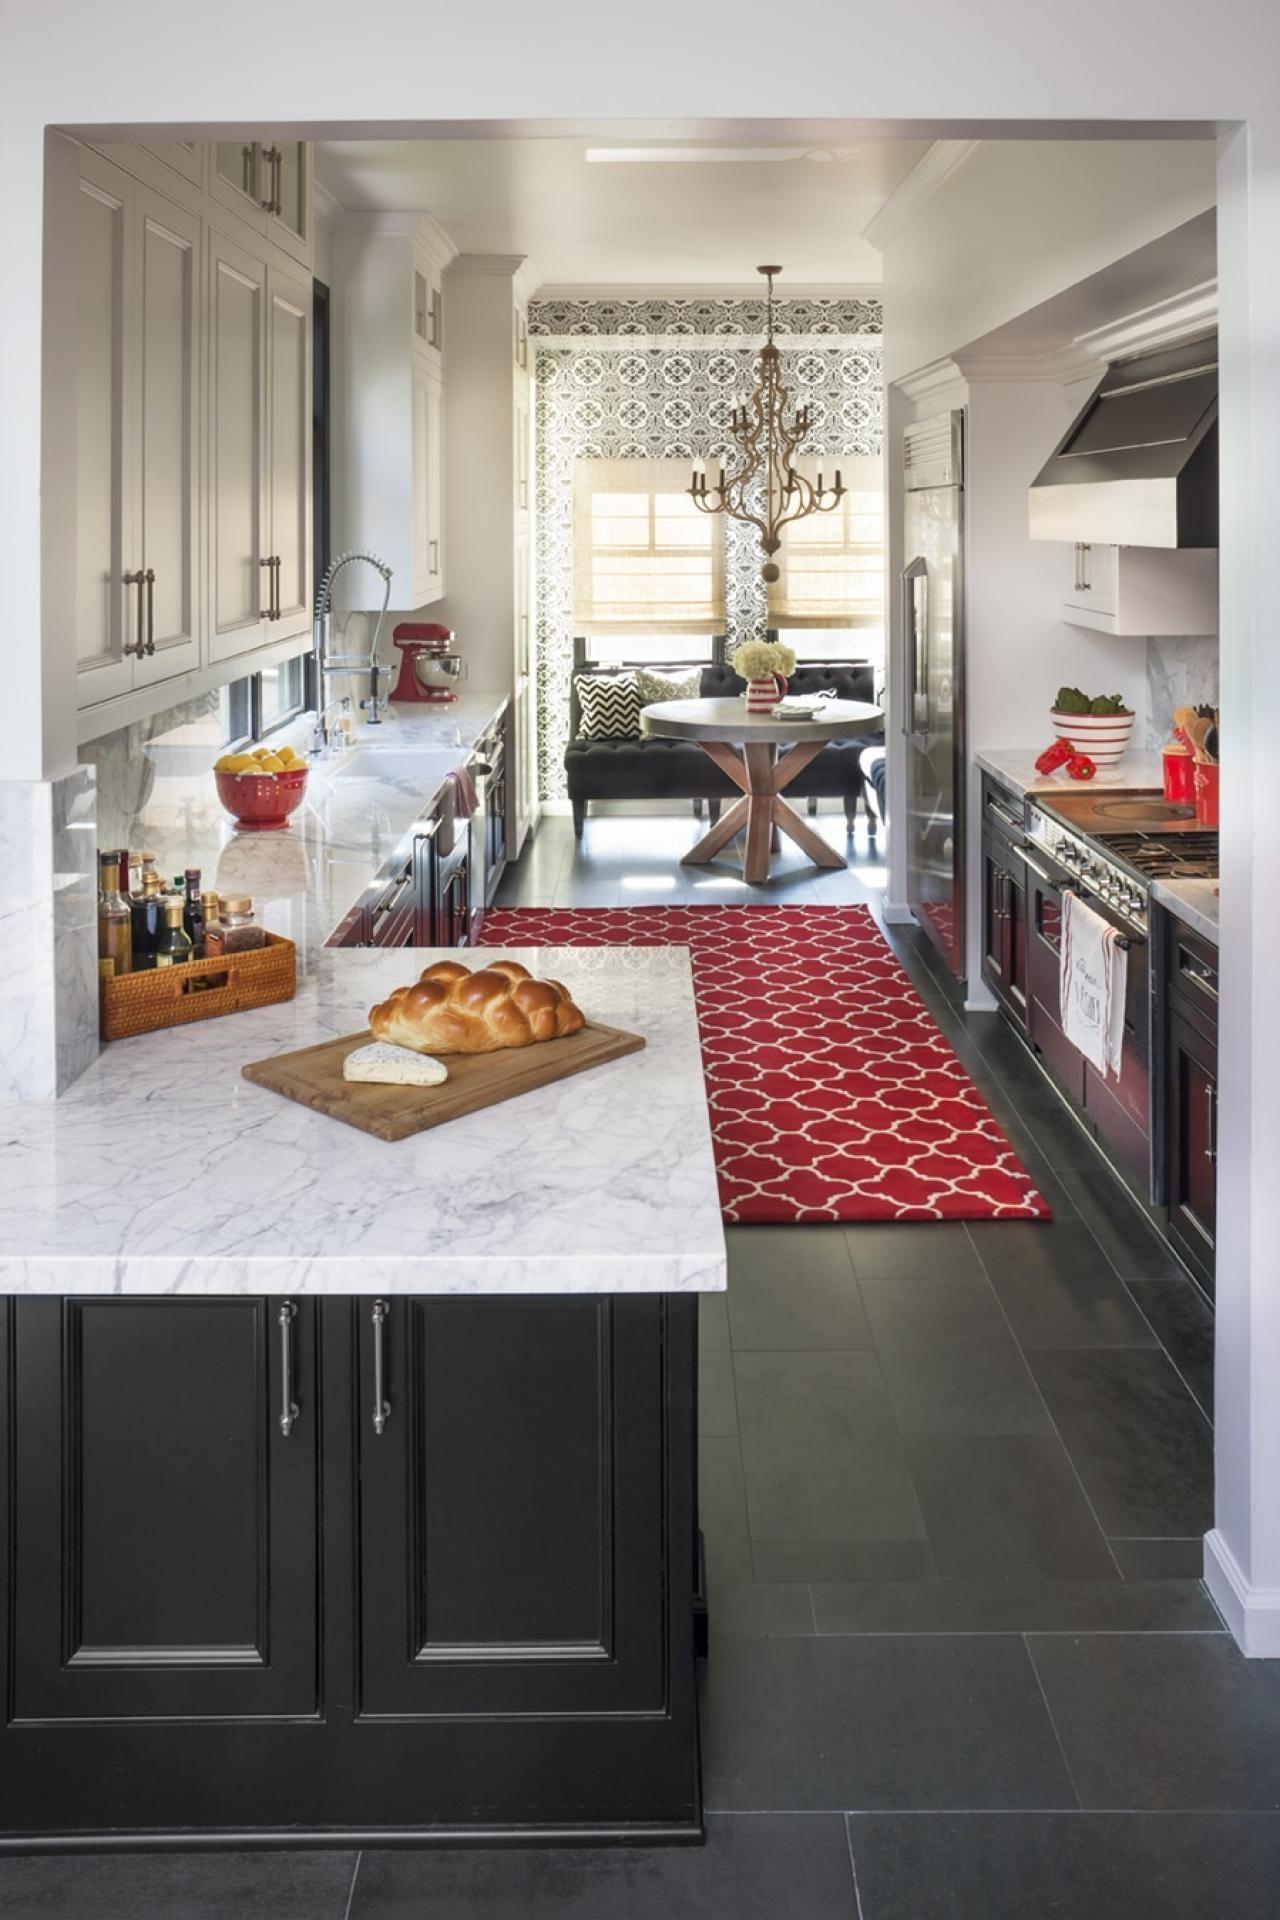 Küchenideen offen gray kitchens bathrooms and more  home decor  pinterest  cocinas